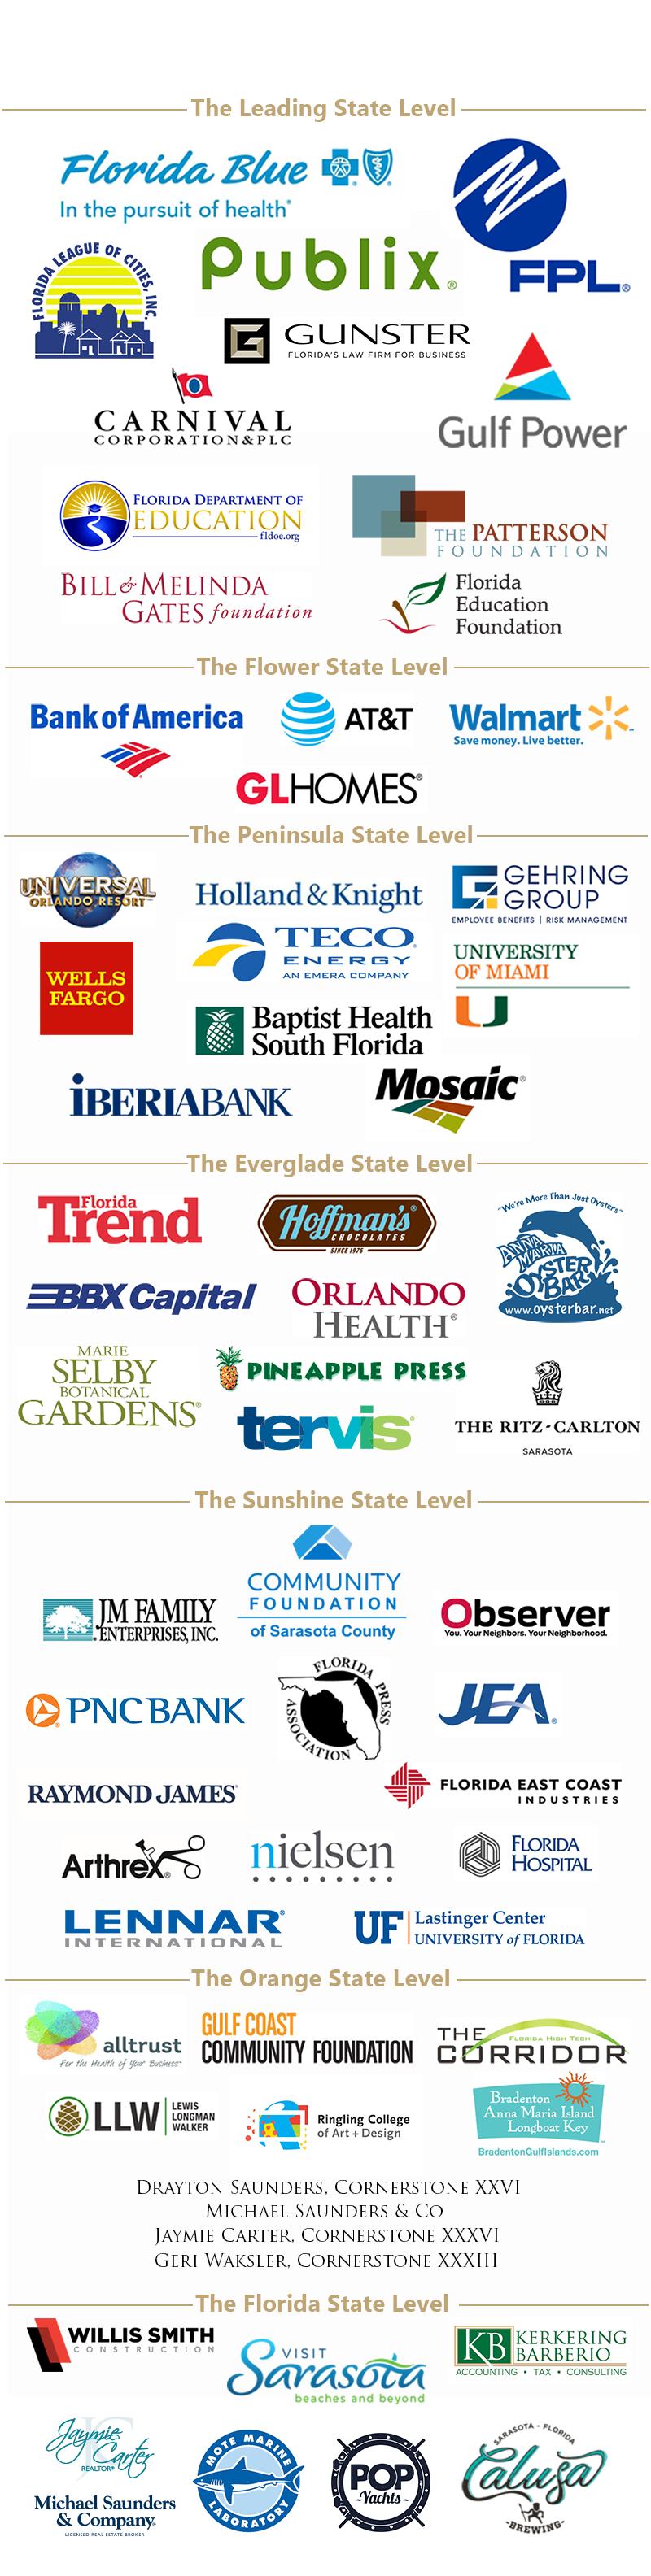 2018 Annual Meeting Sponsors